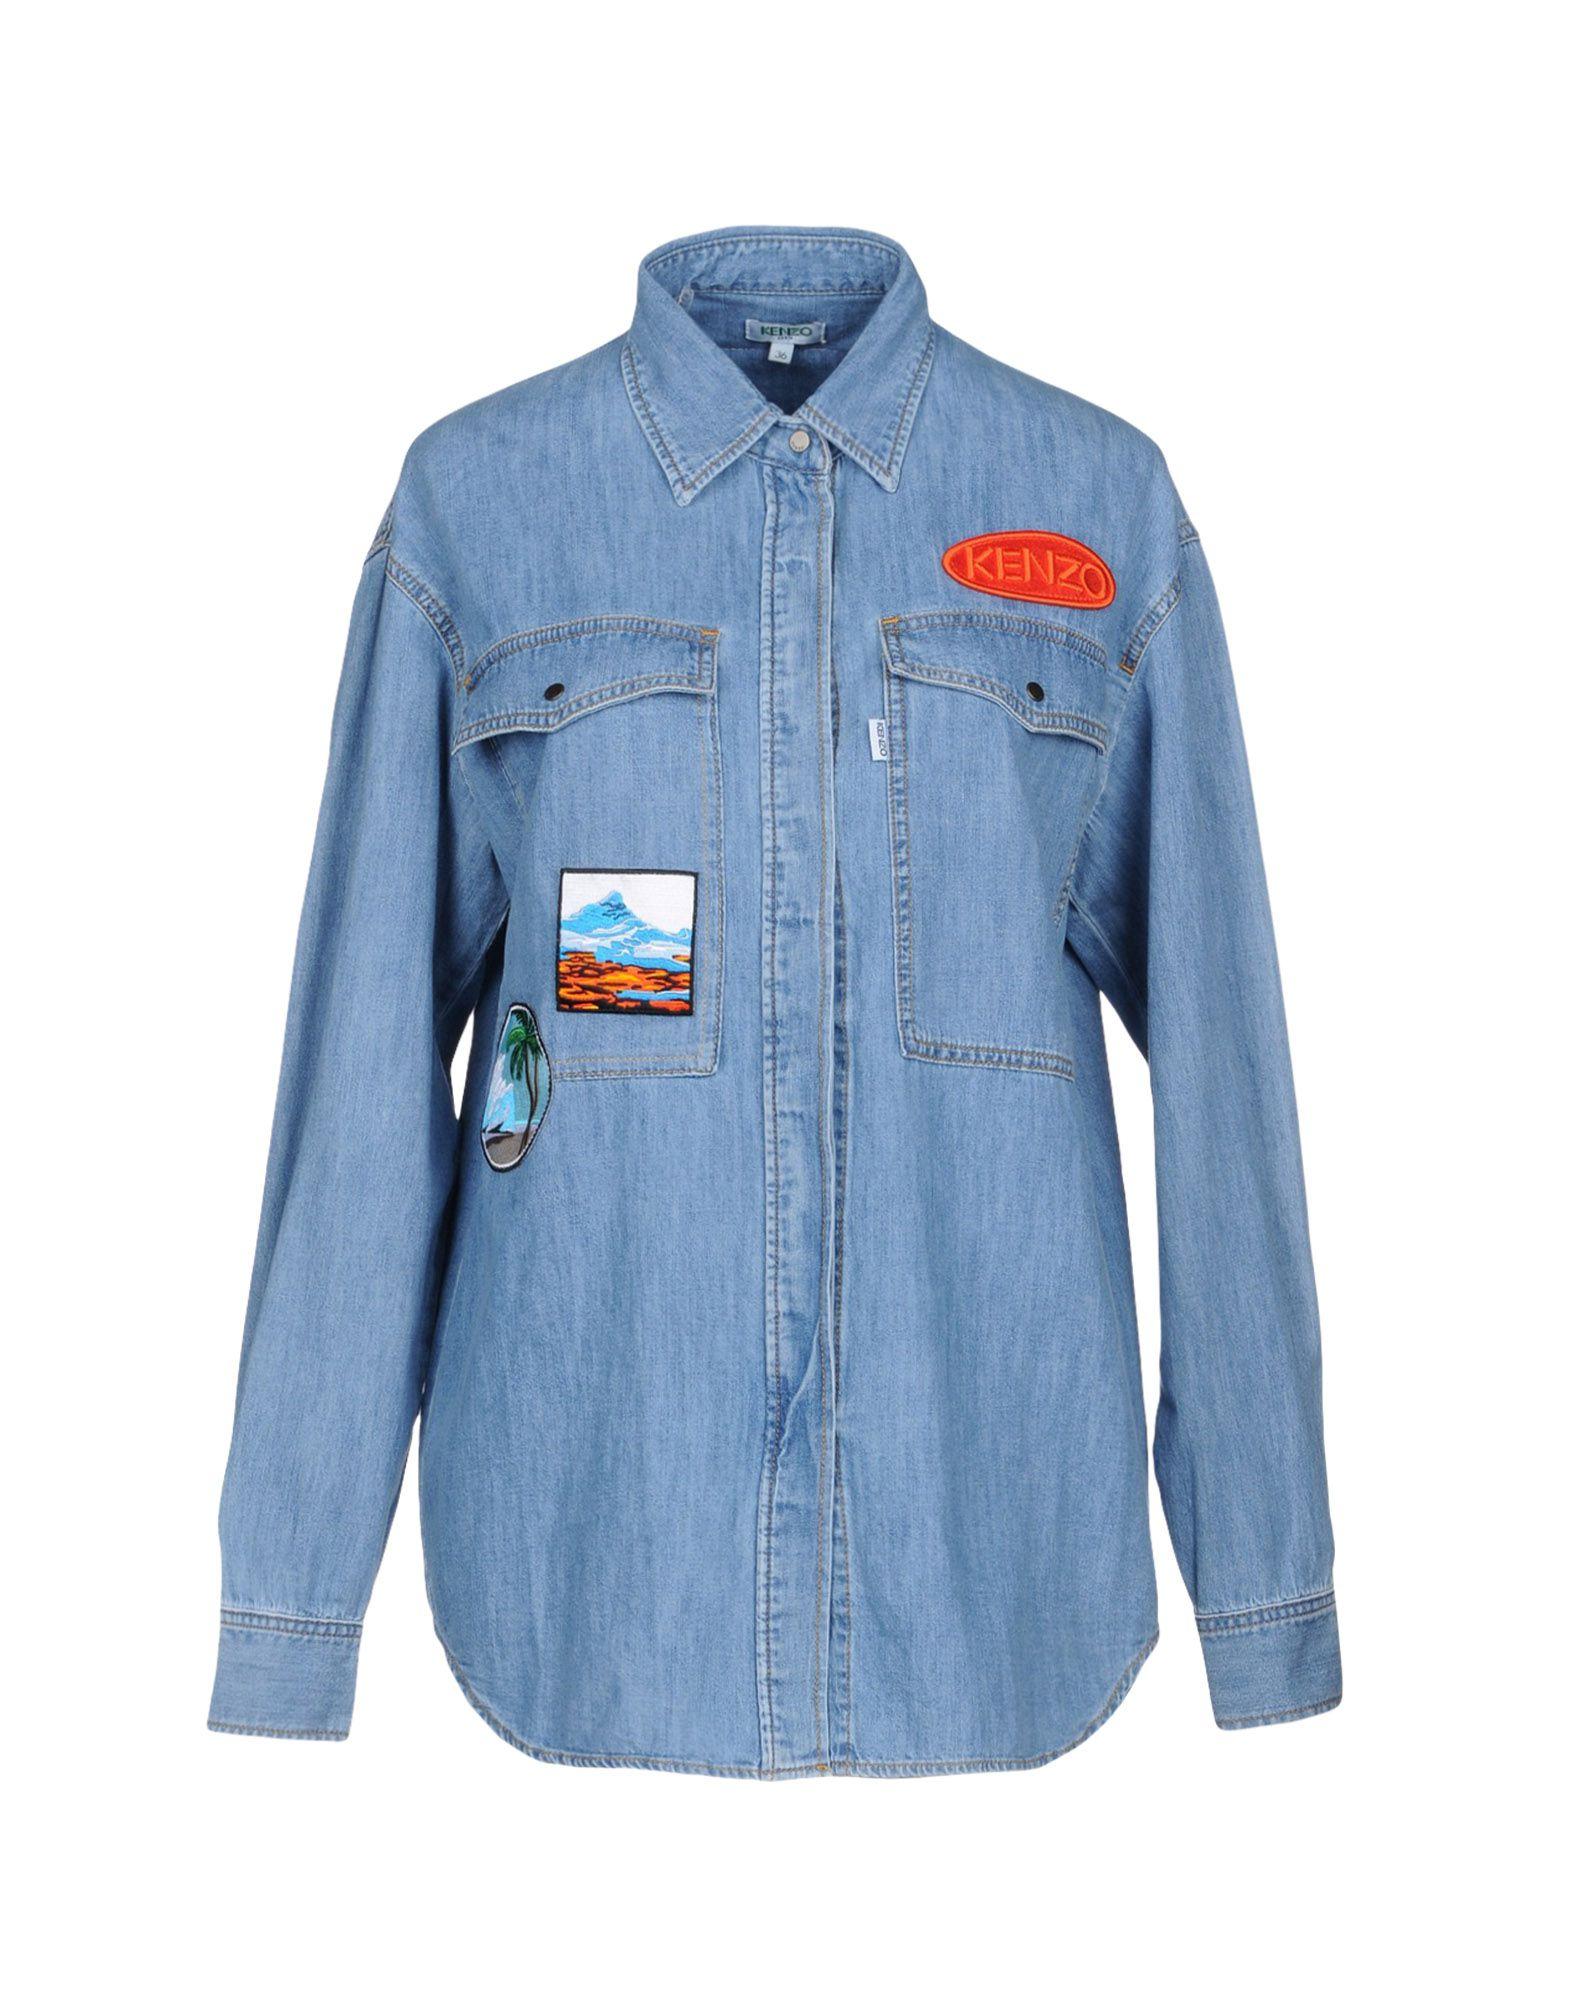 KENZO Джинсовая рубашка maytoni eco004 02 n